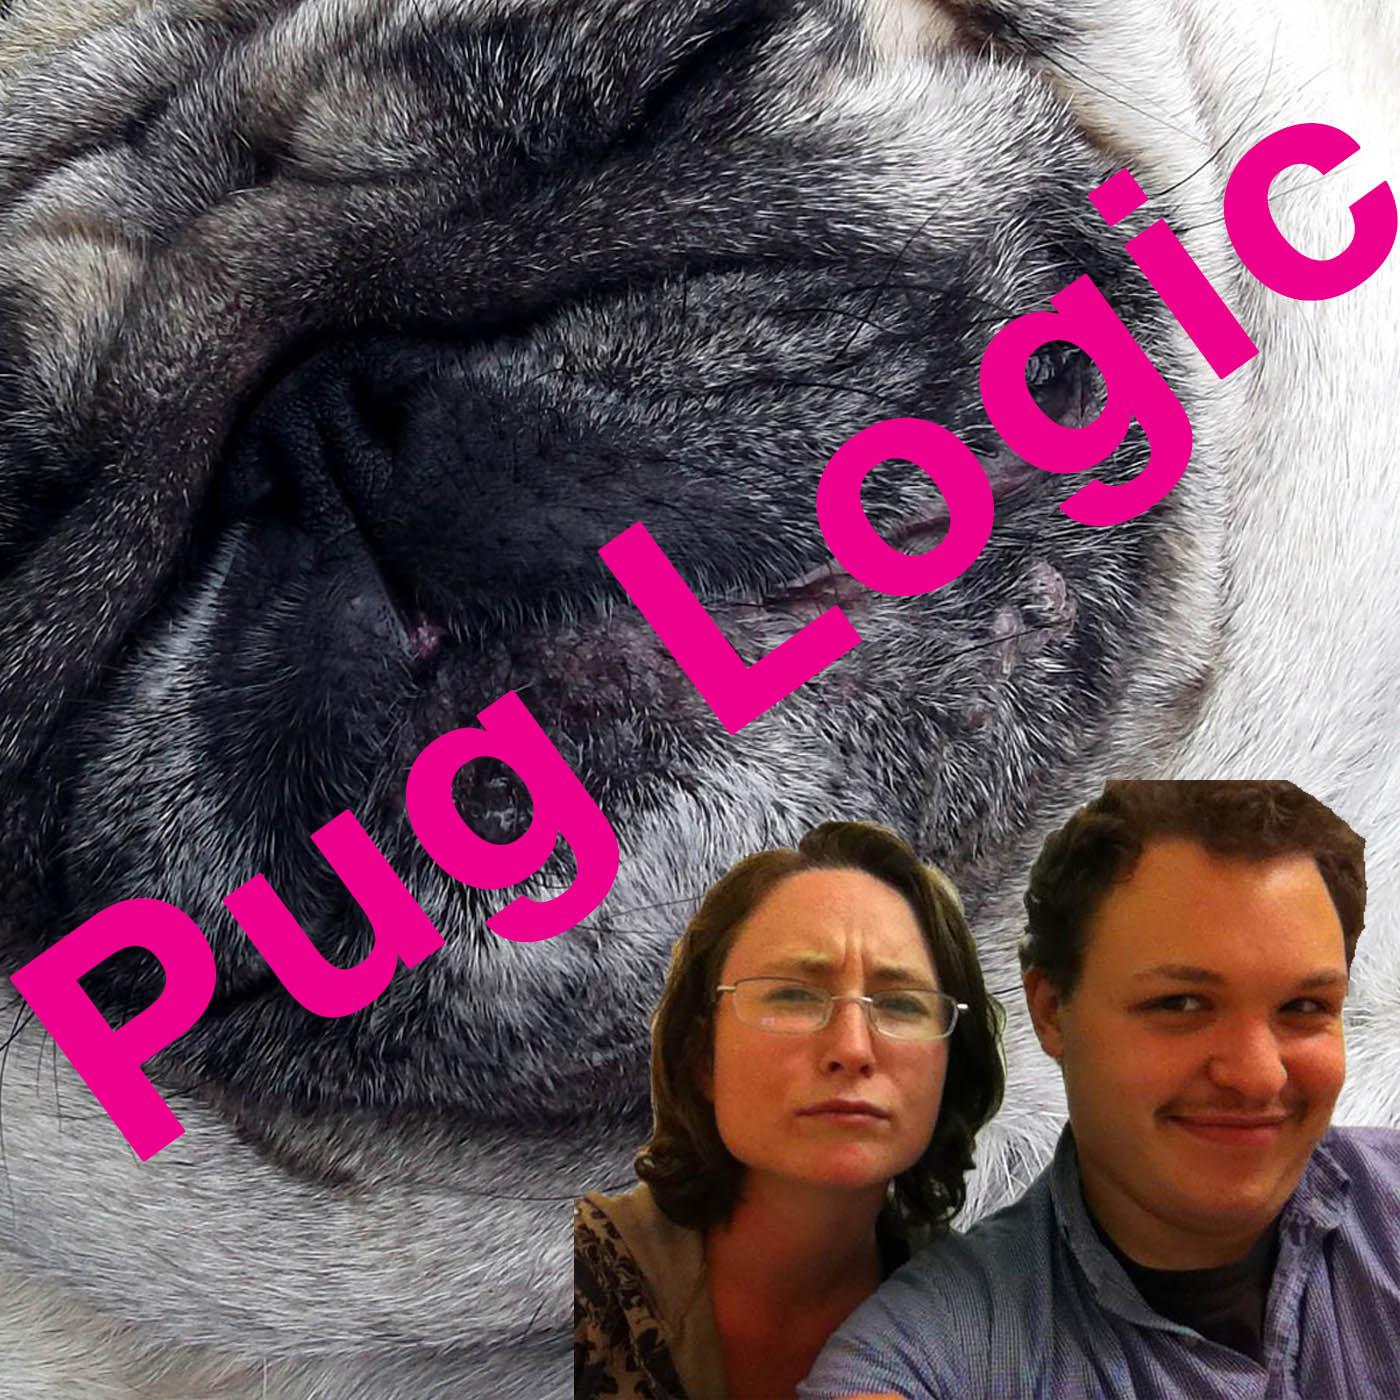 Pug Logic